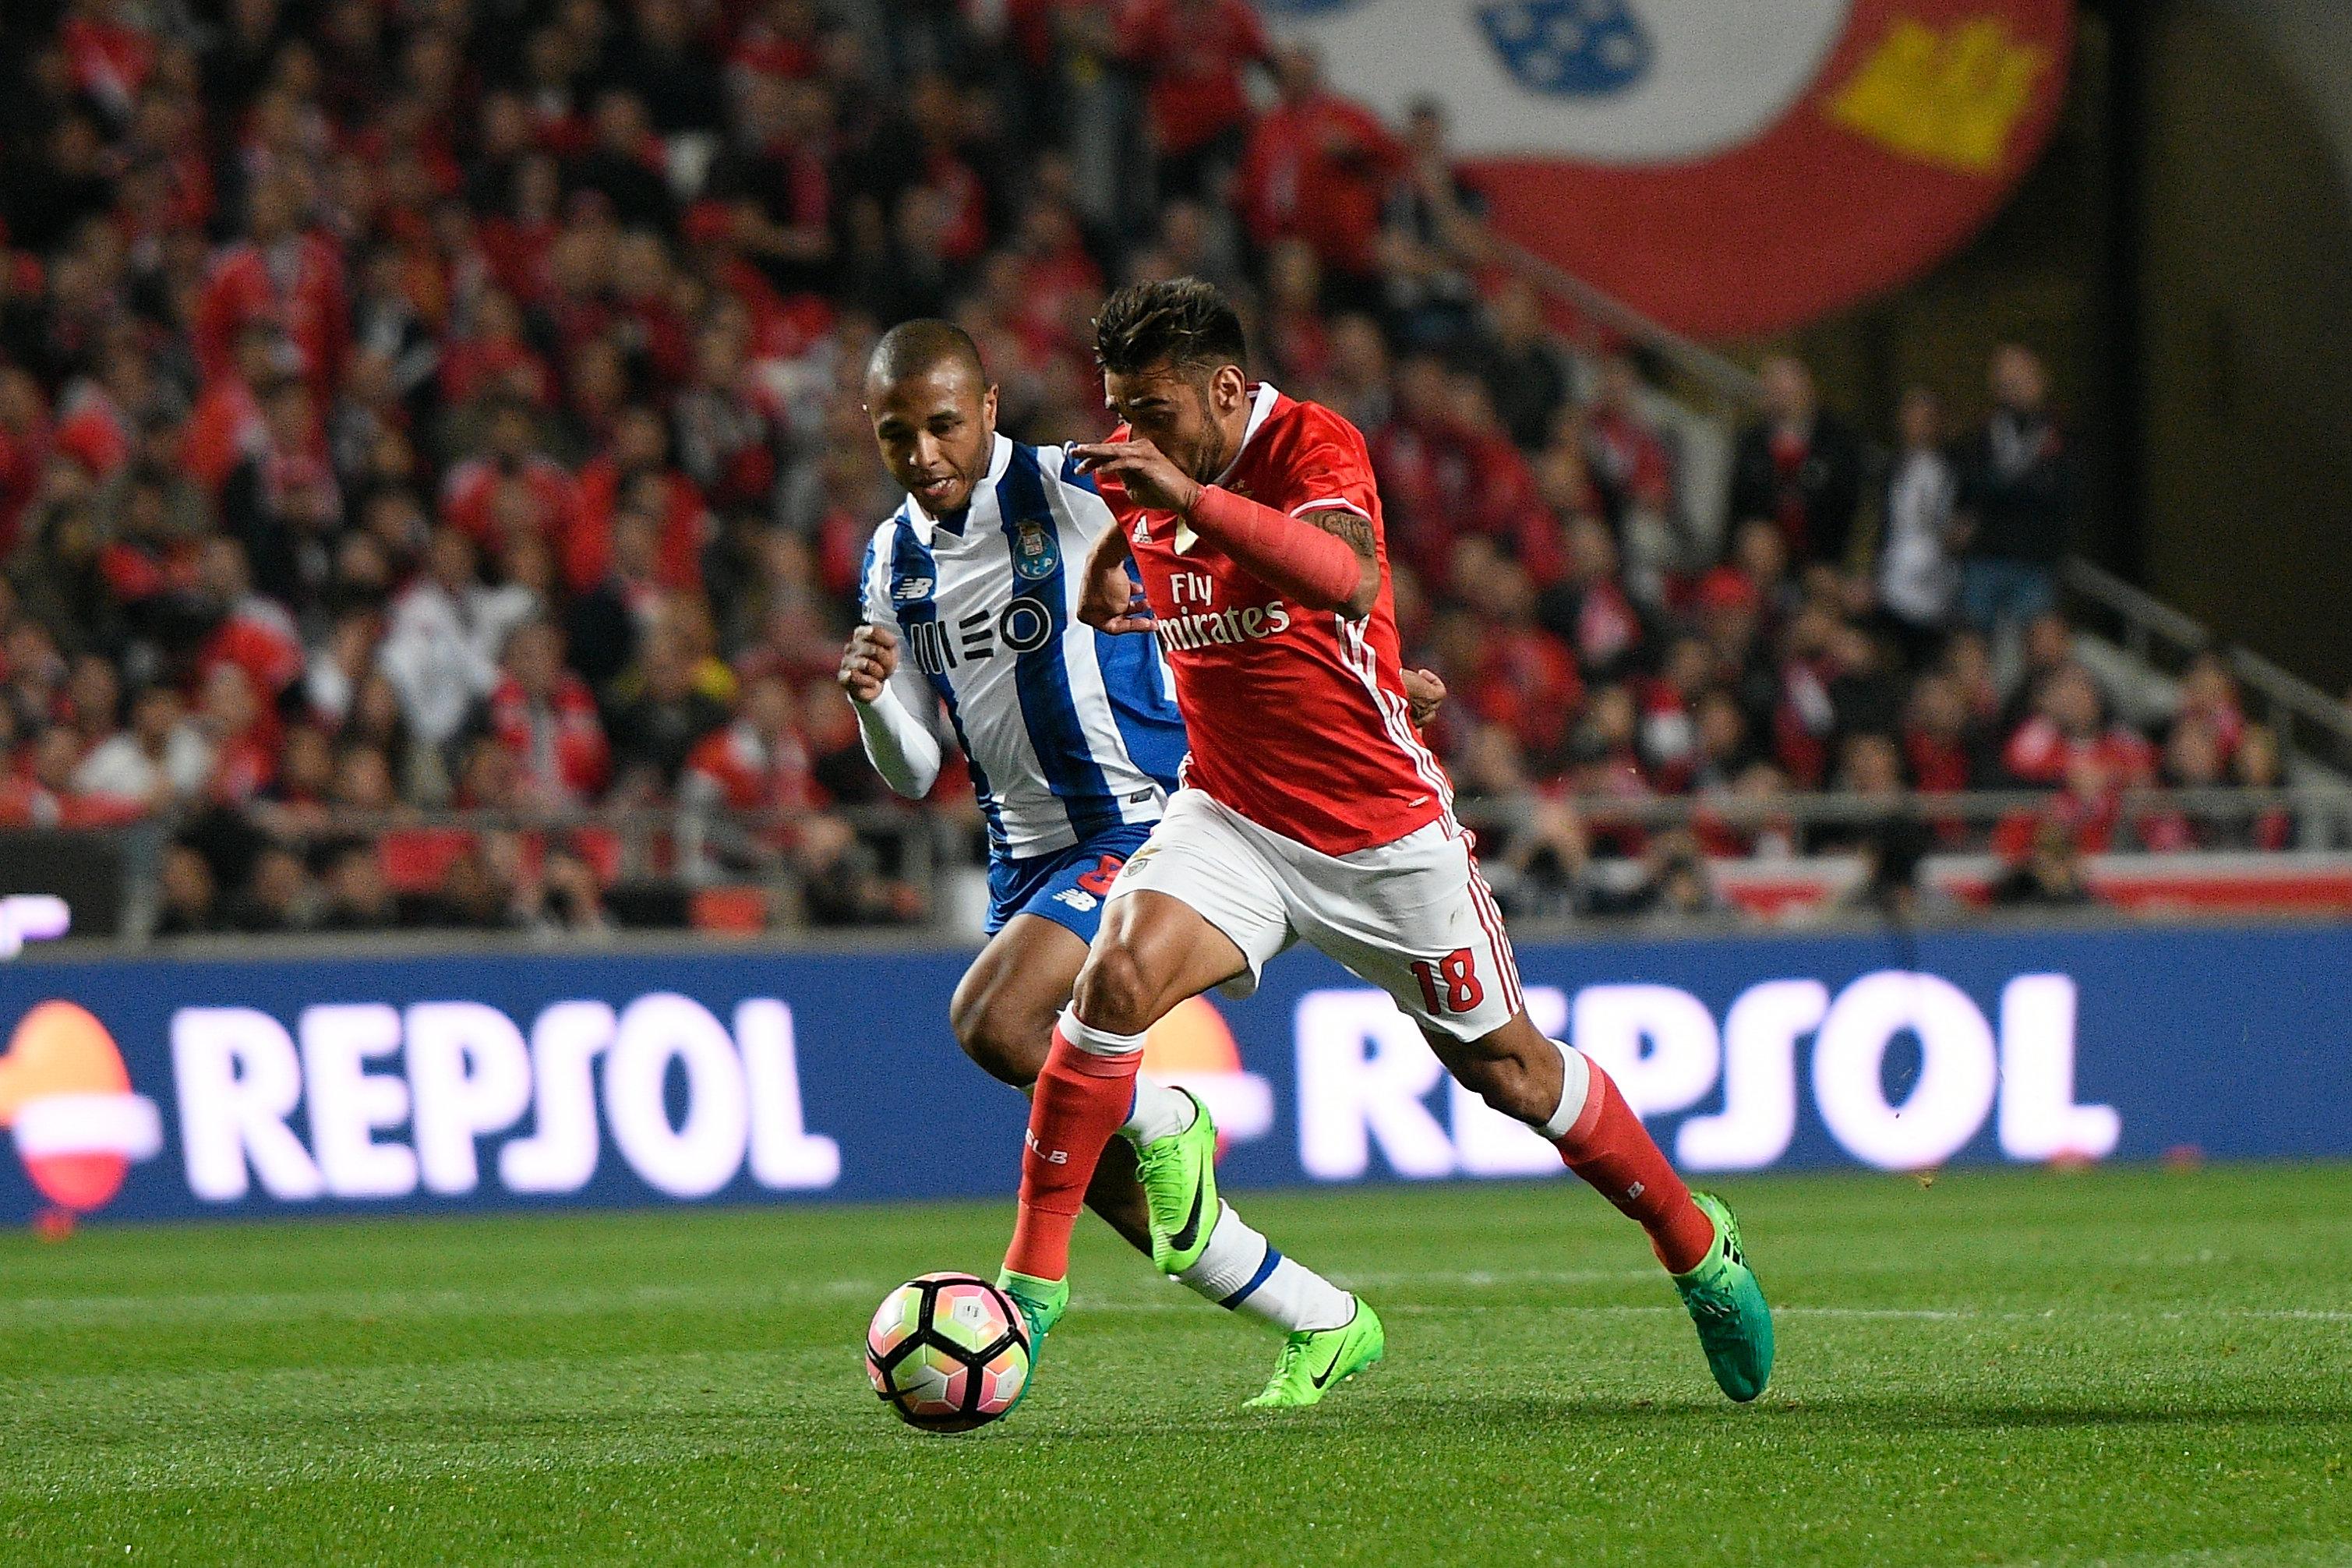 1. liga portugal